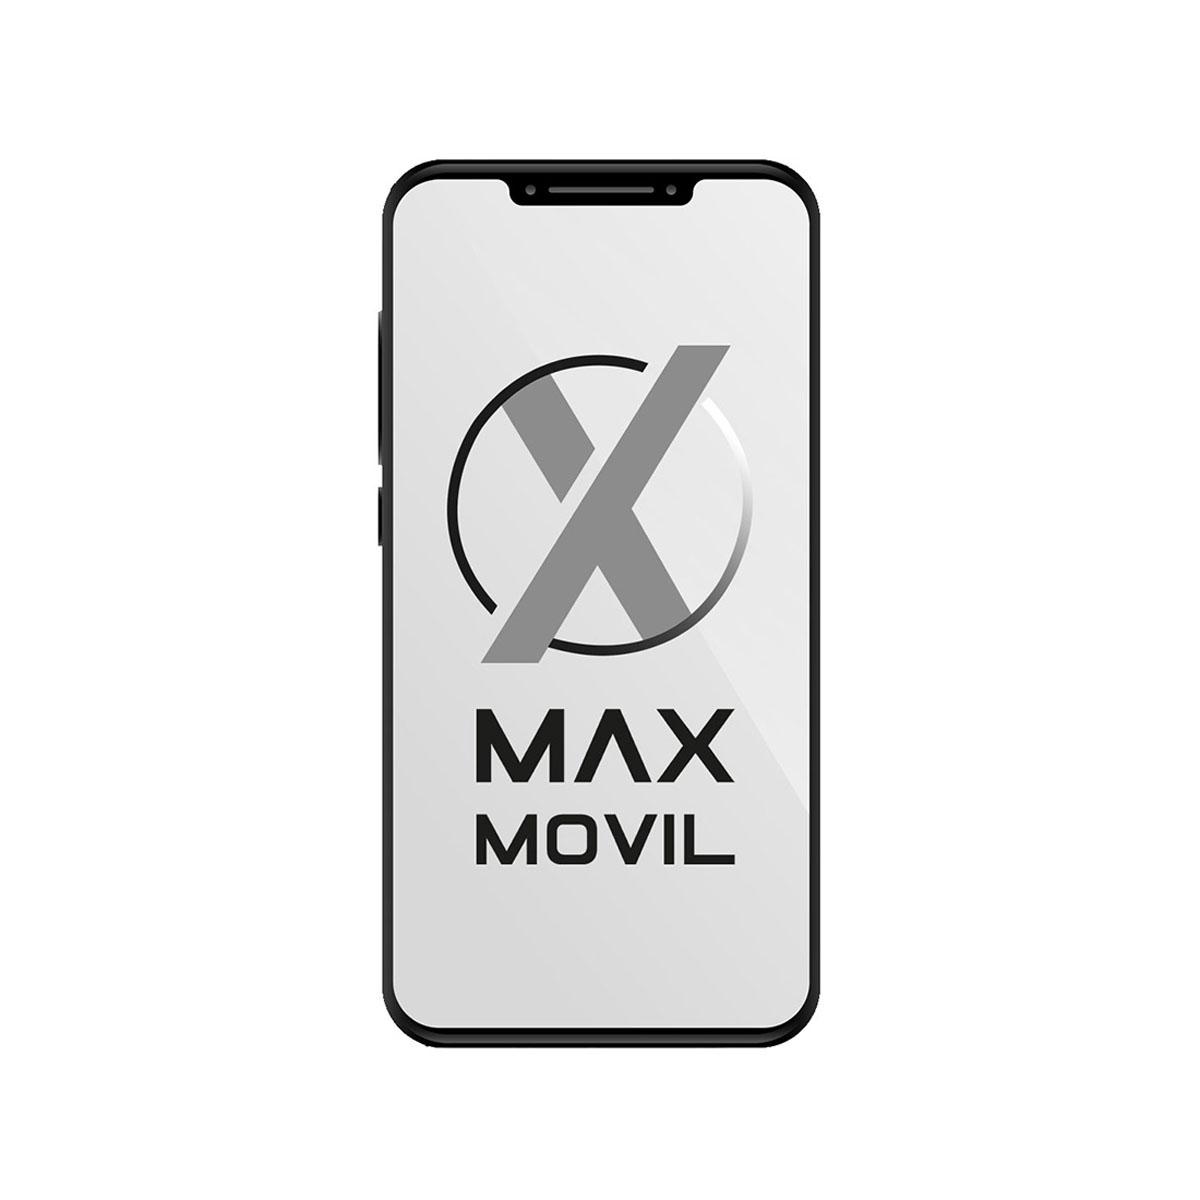 "Funda universal Tablet Silverht estampada Pixel Gamer 9 a 10.1"""